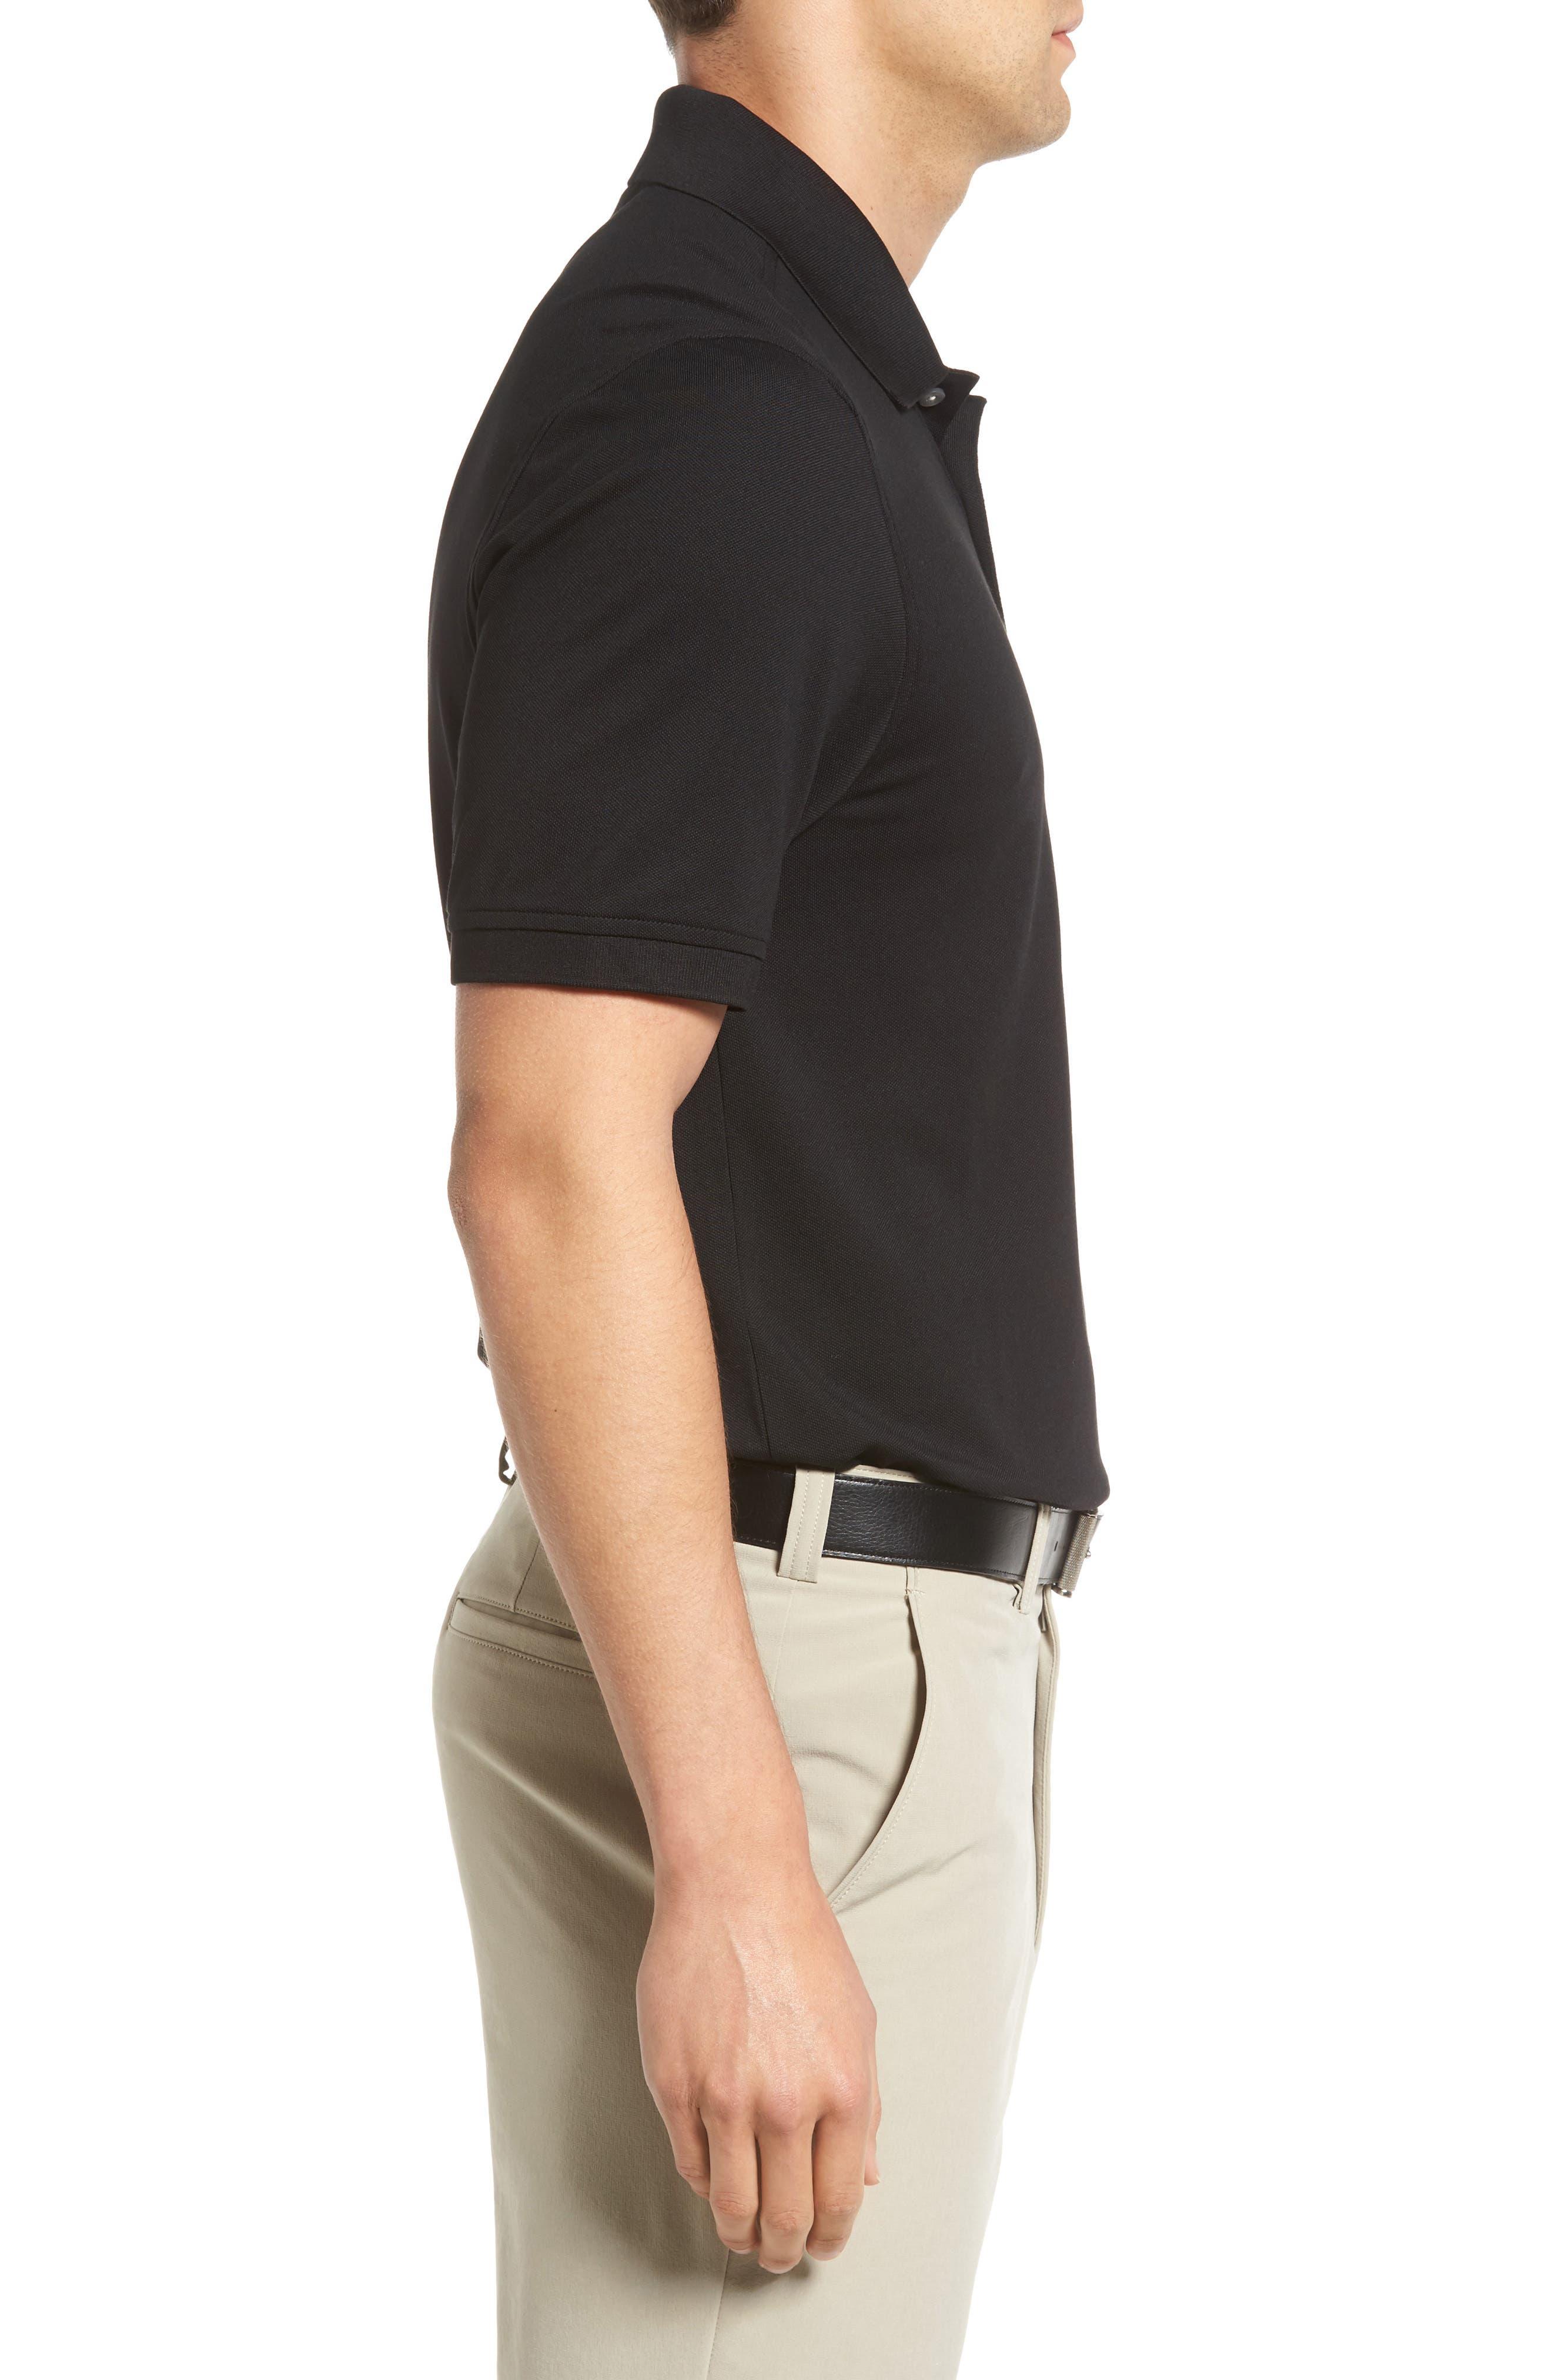 CUTTER & BUCK, Advantage Golf Polo, Alternate thumbnail 3, color, BLACK